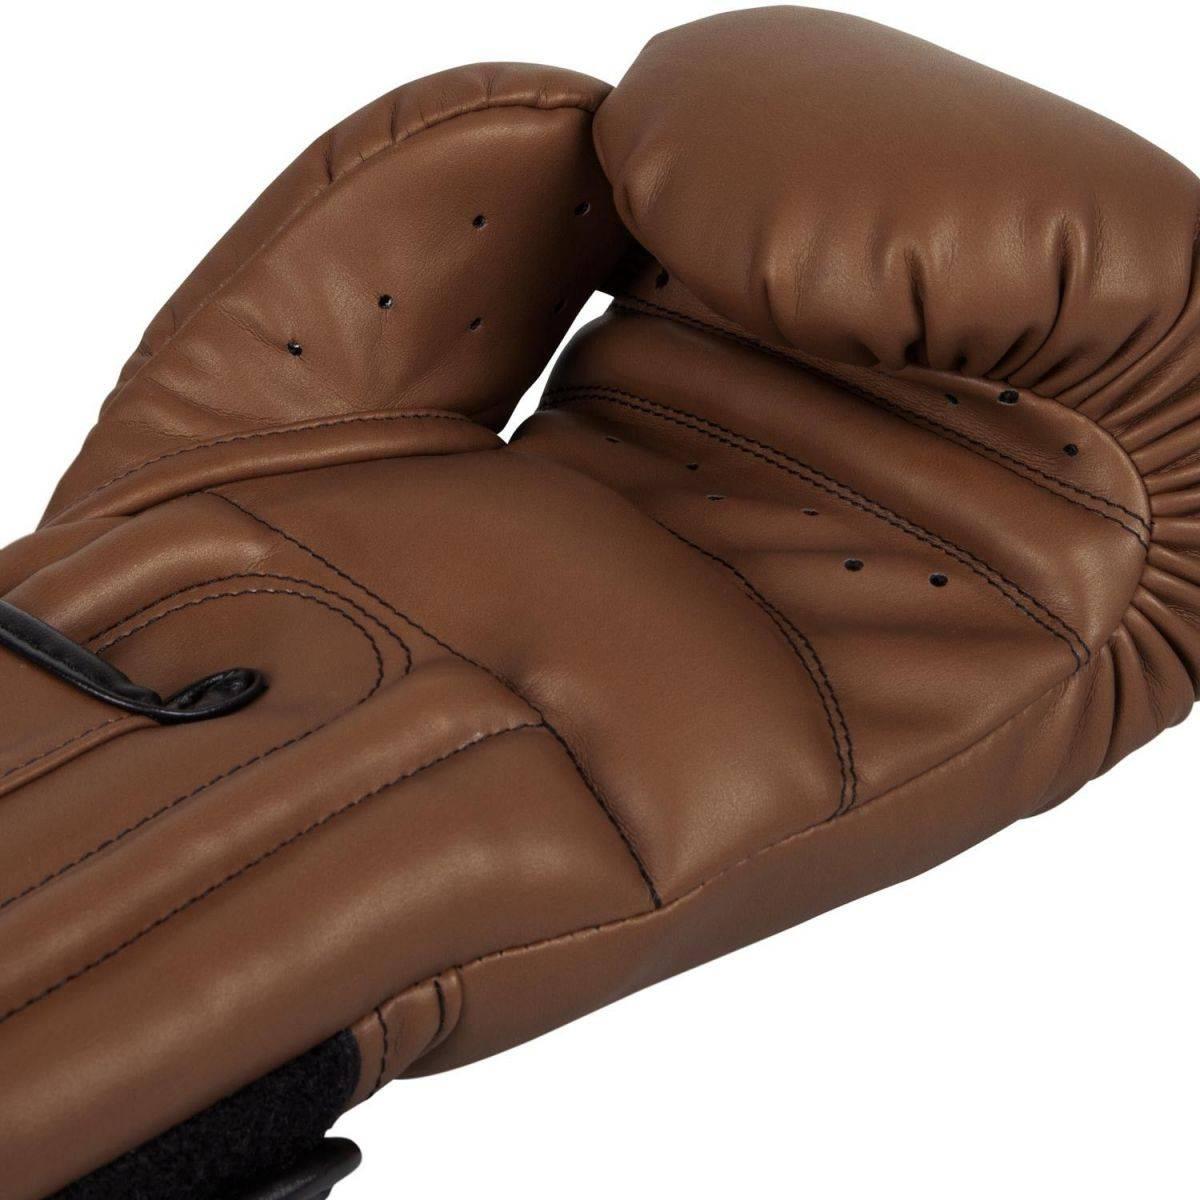 Боксерские перчатки Venum Giant Sparring Boxing Gloves